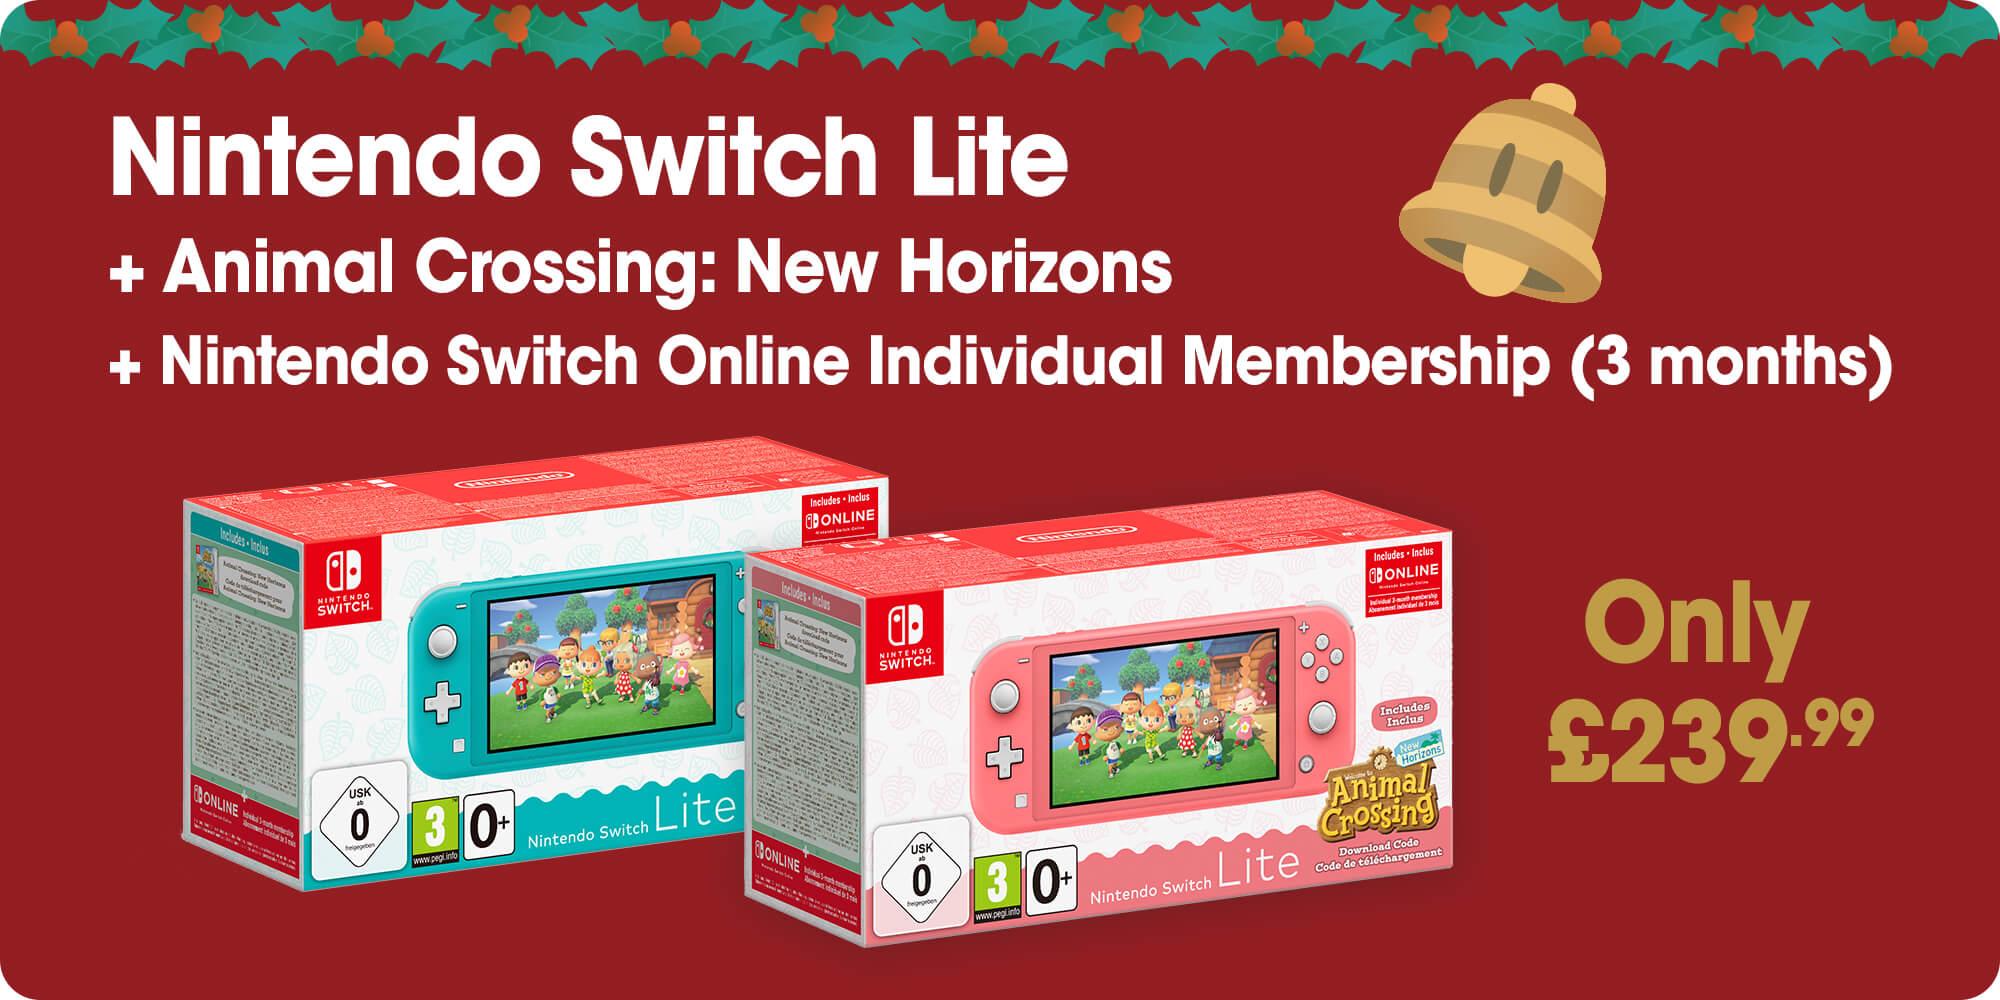 Nintendo Switch Lite console + Animal Crossing: New Horizons + Nintendo Switch Online Individual Membership